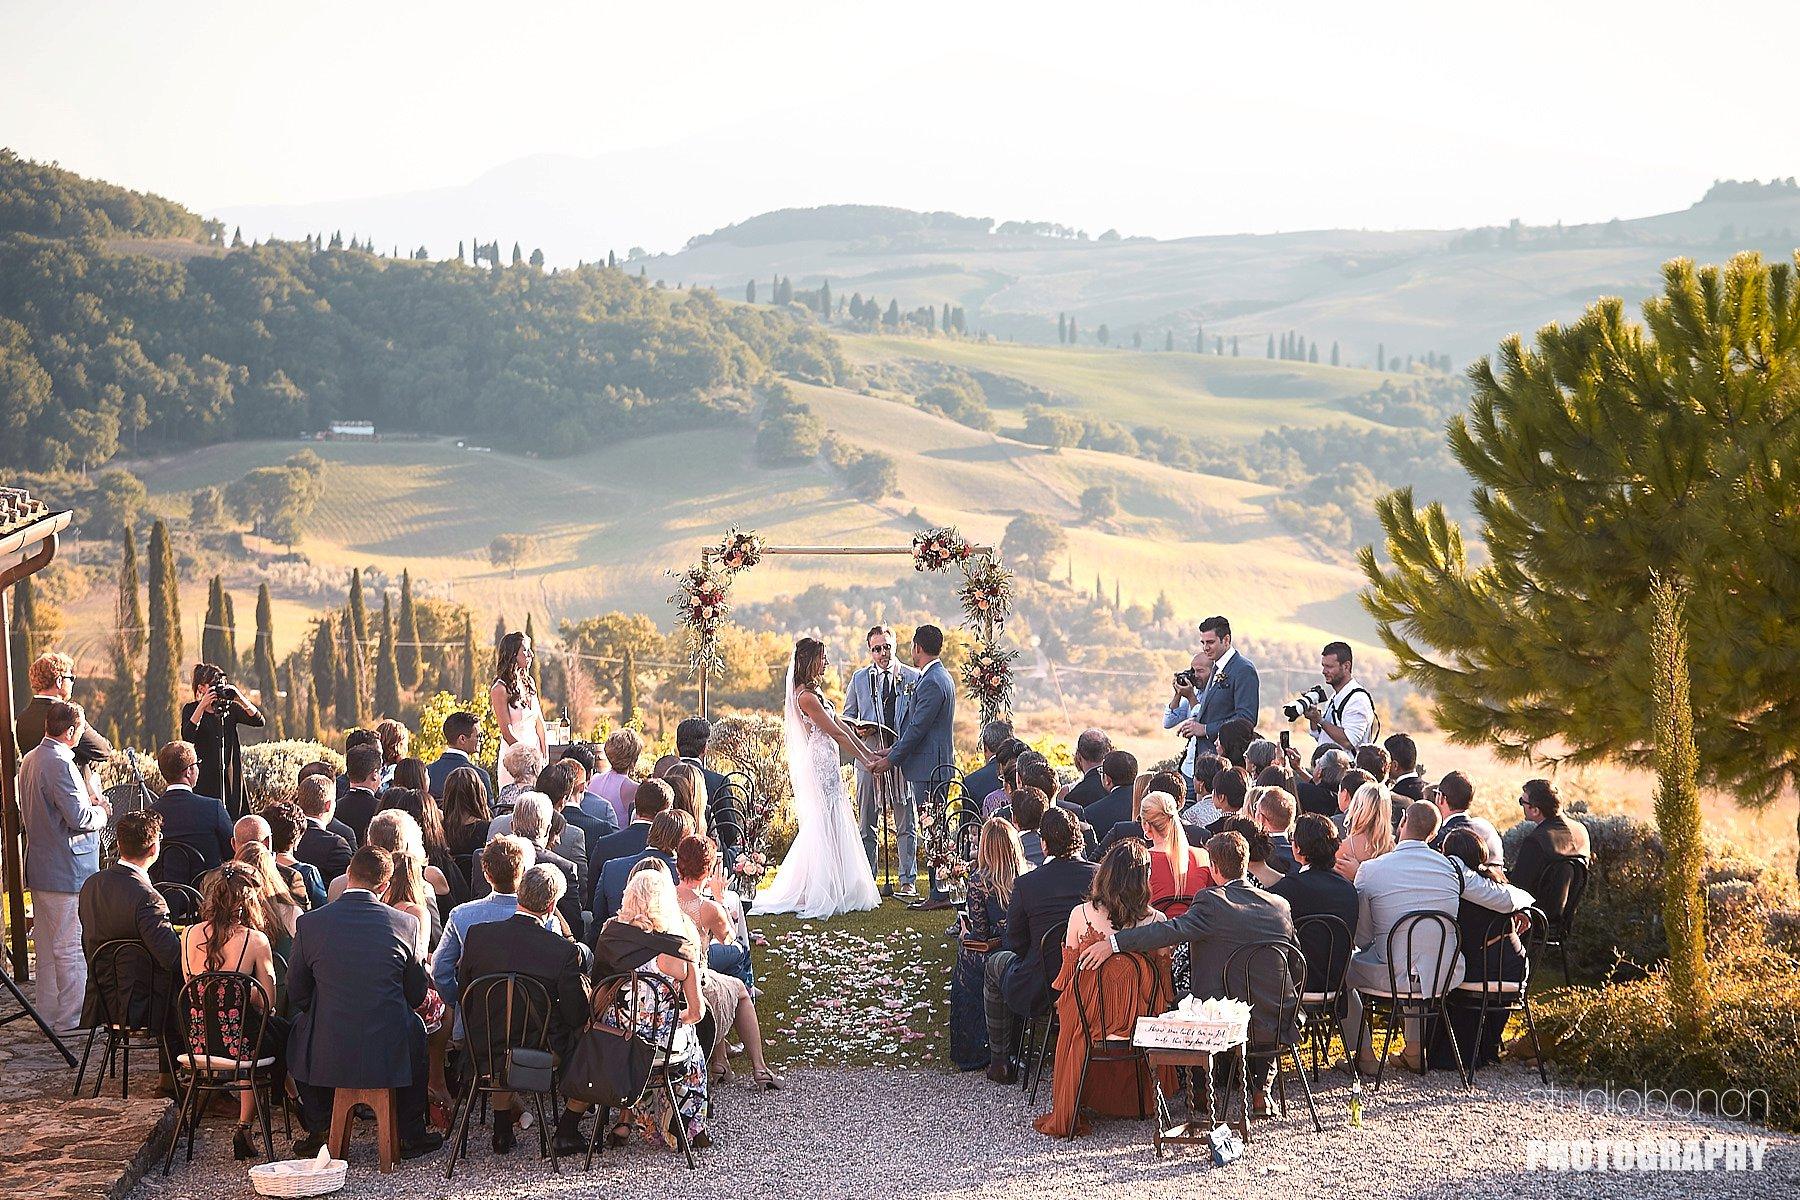 Matrimonio Country Toscana : Matrimonio stile country rustic in toscana all agriturismo terre